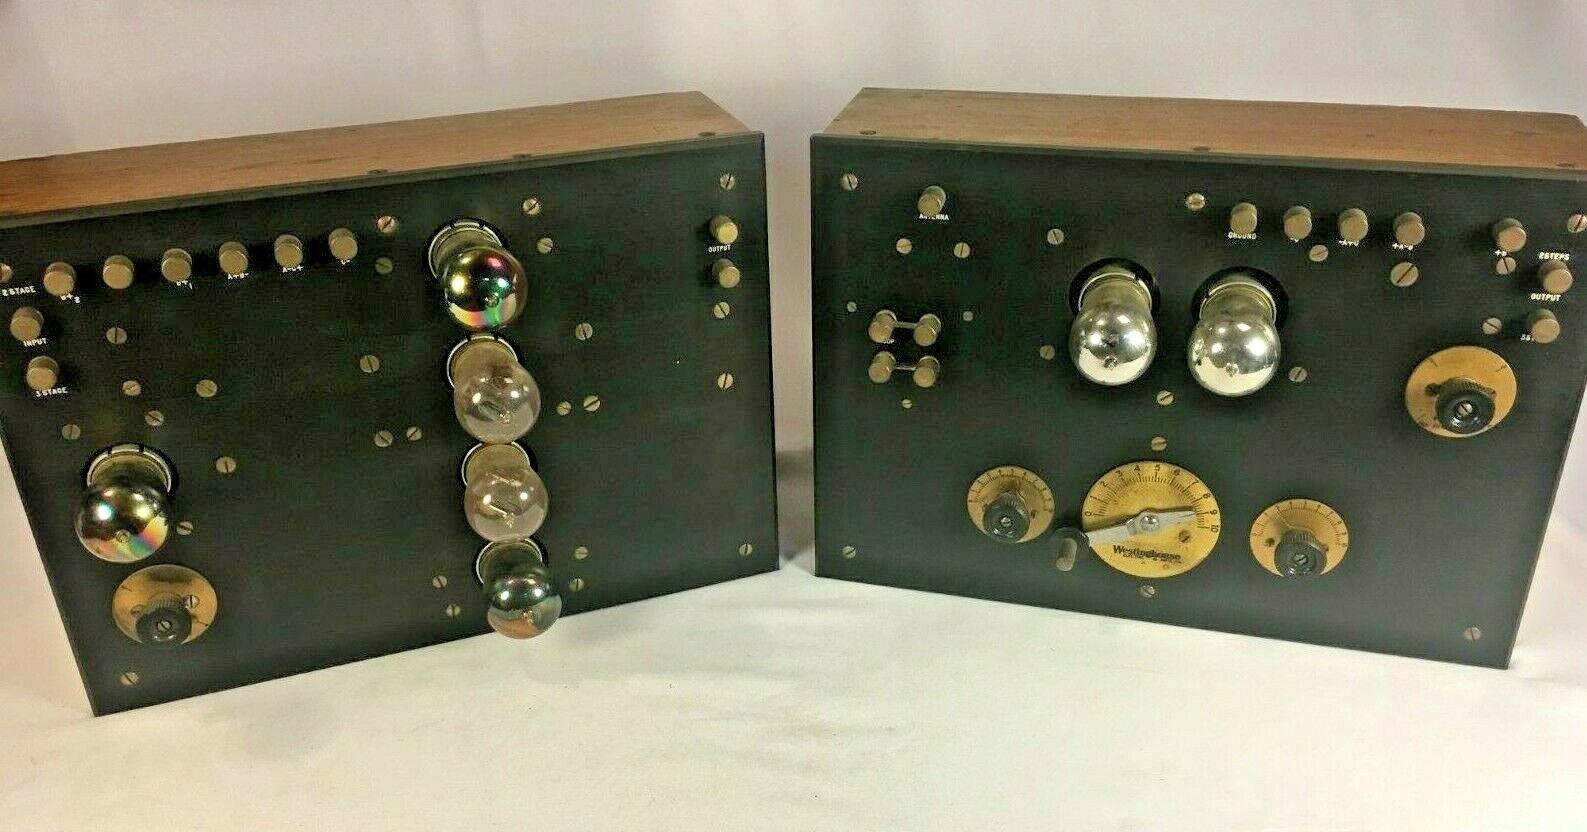 Westinghouse RCA SUPER RARE 2-tube Rebroadcast Receiver 5-tube Amp 20s Radio